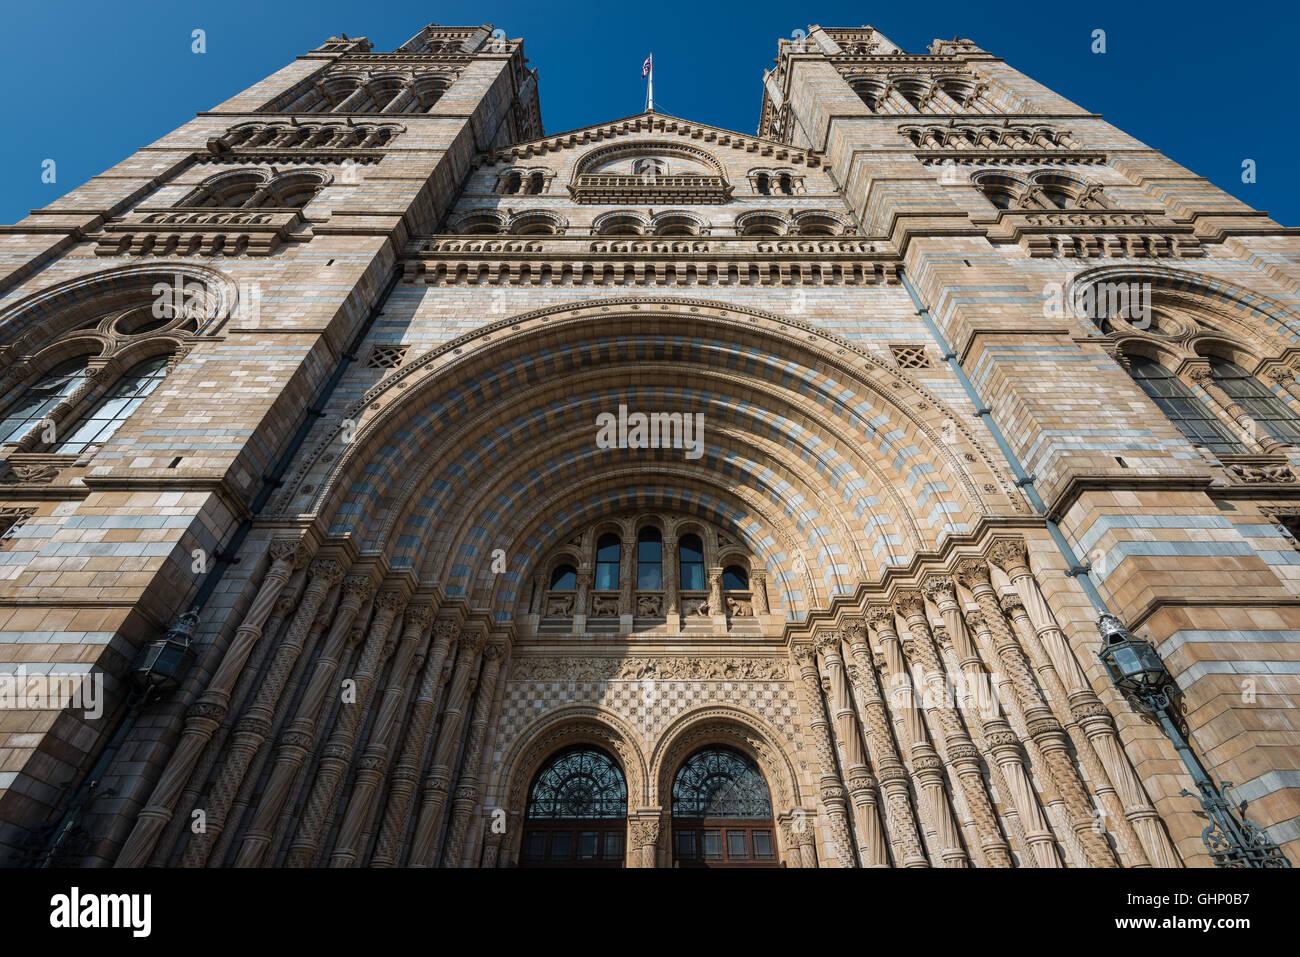 Natural History Museum, London, United Kingdom - Stock Image